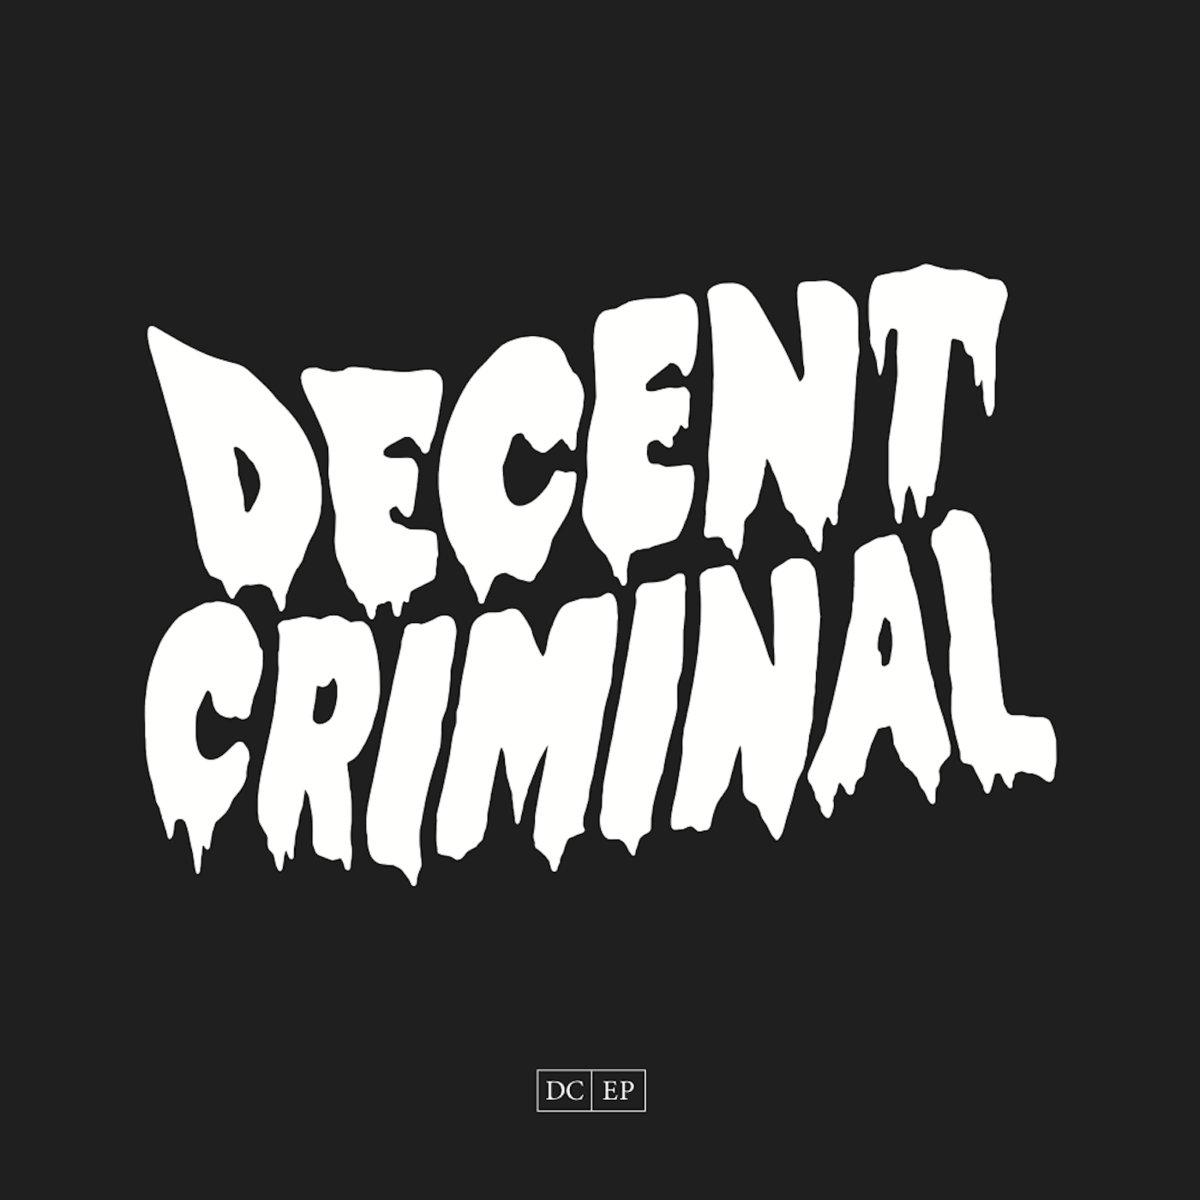 Decent Criminal - DC EP